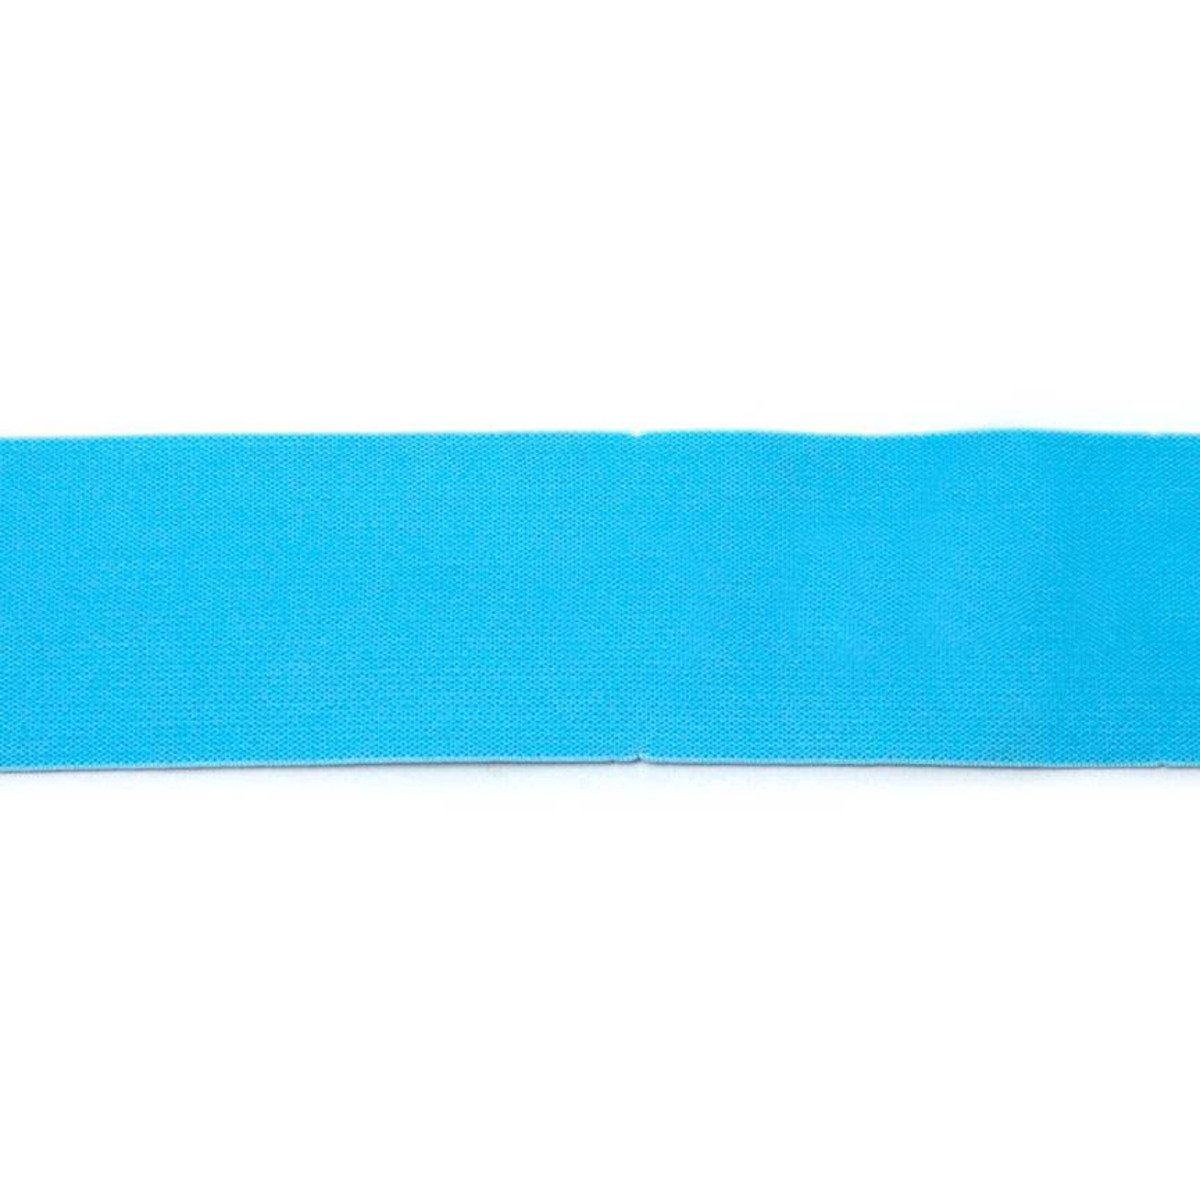 2 inch Waistband Elastic Aqua